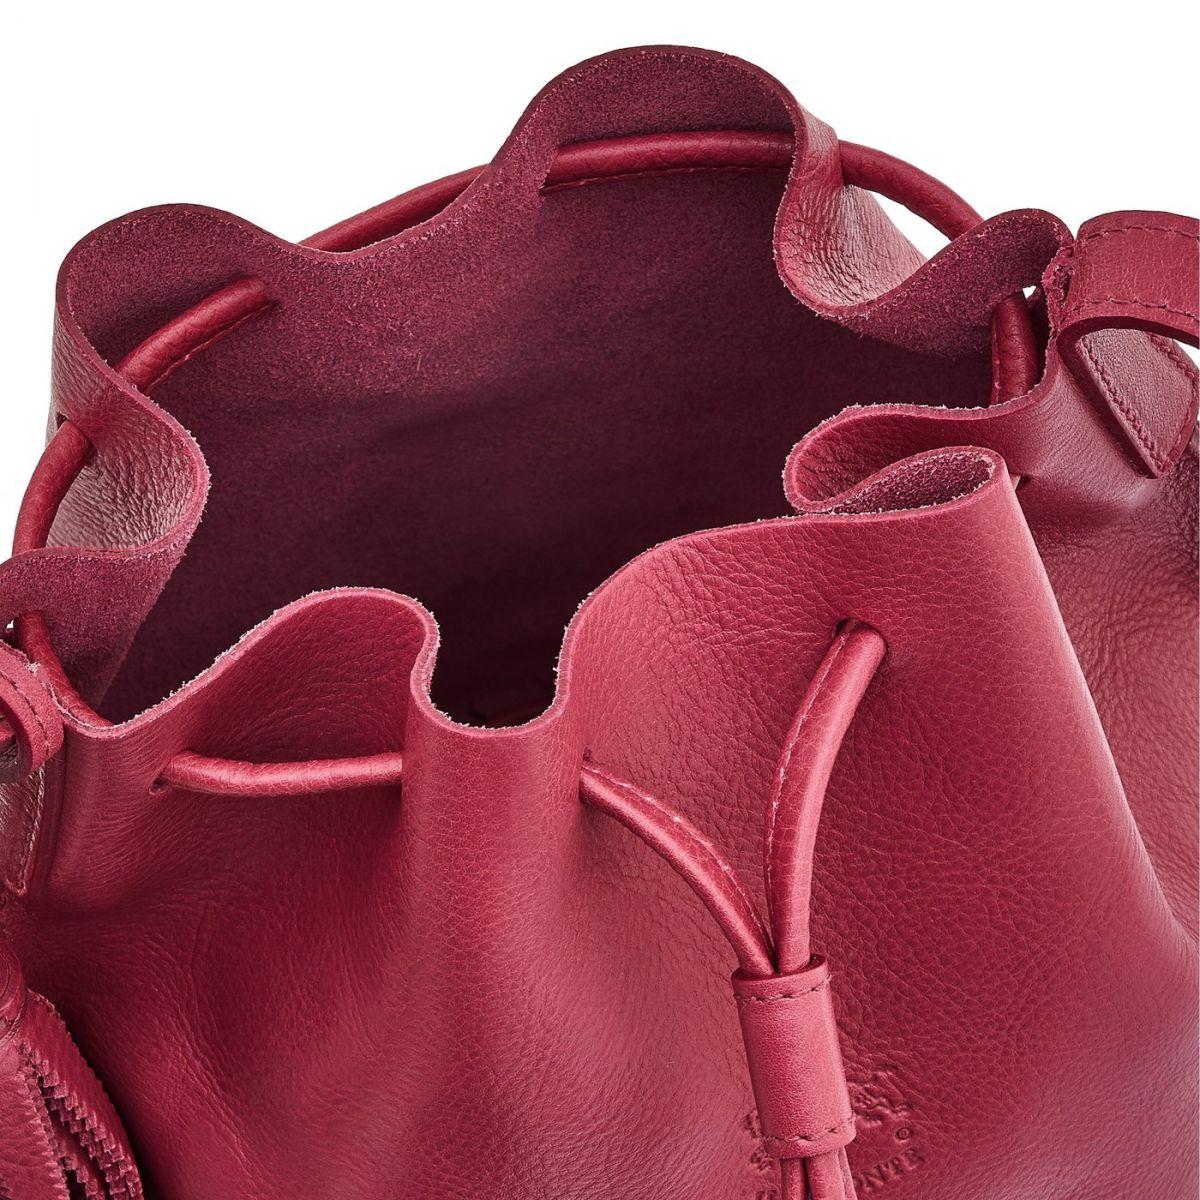 Silvia - Women's Bucket Bag Stibbert in Cowhide Leather BBU006 color Sumac | Details